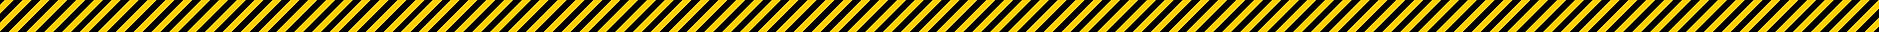 Hazard Stripe 02.jpg